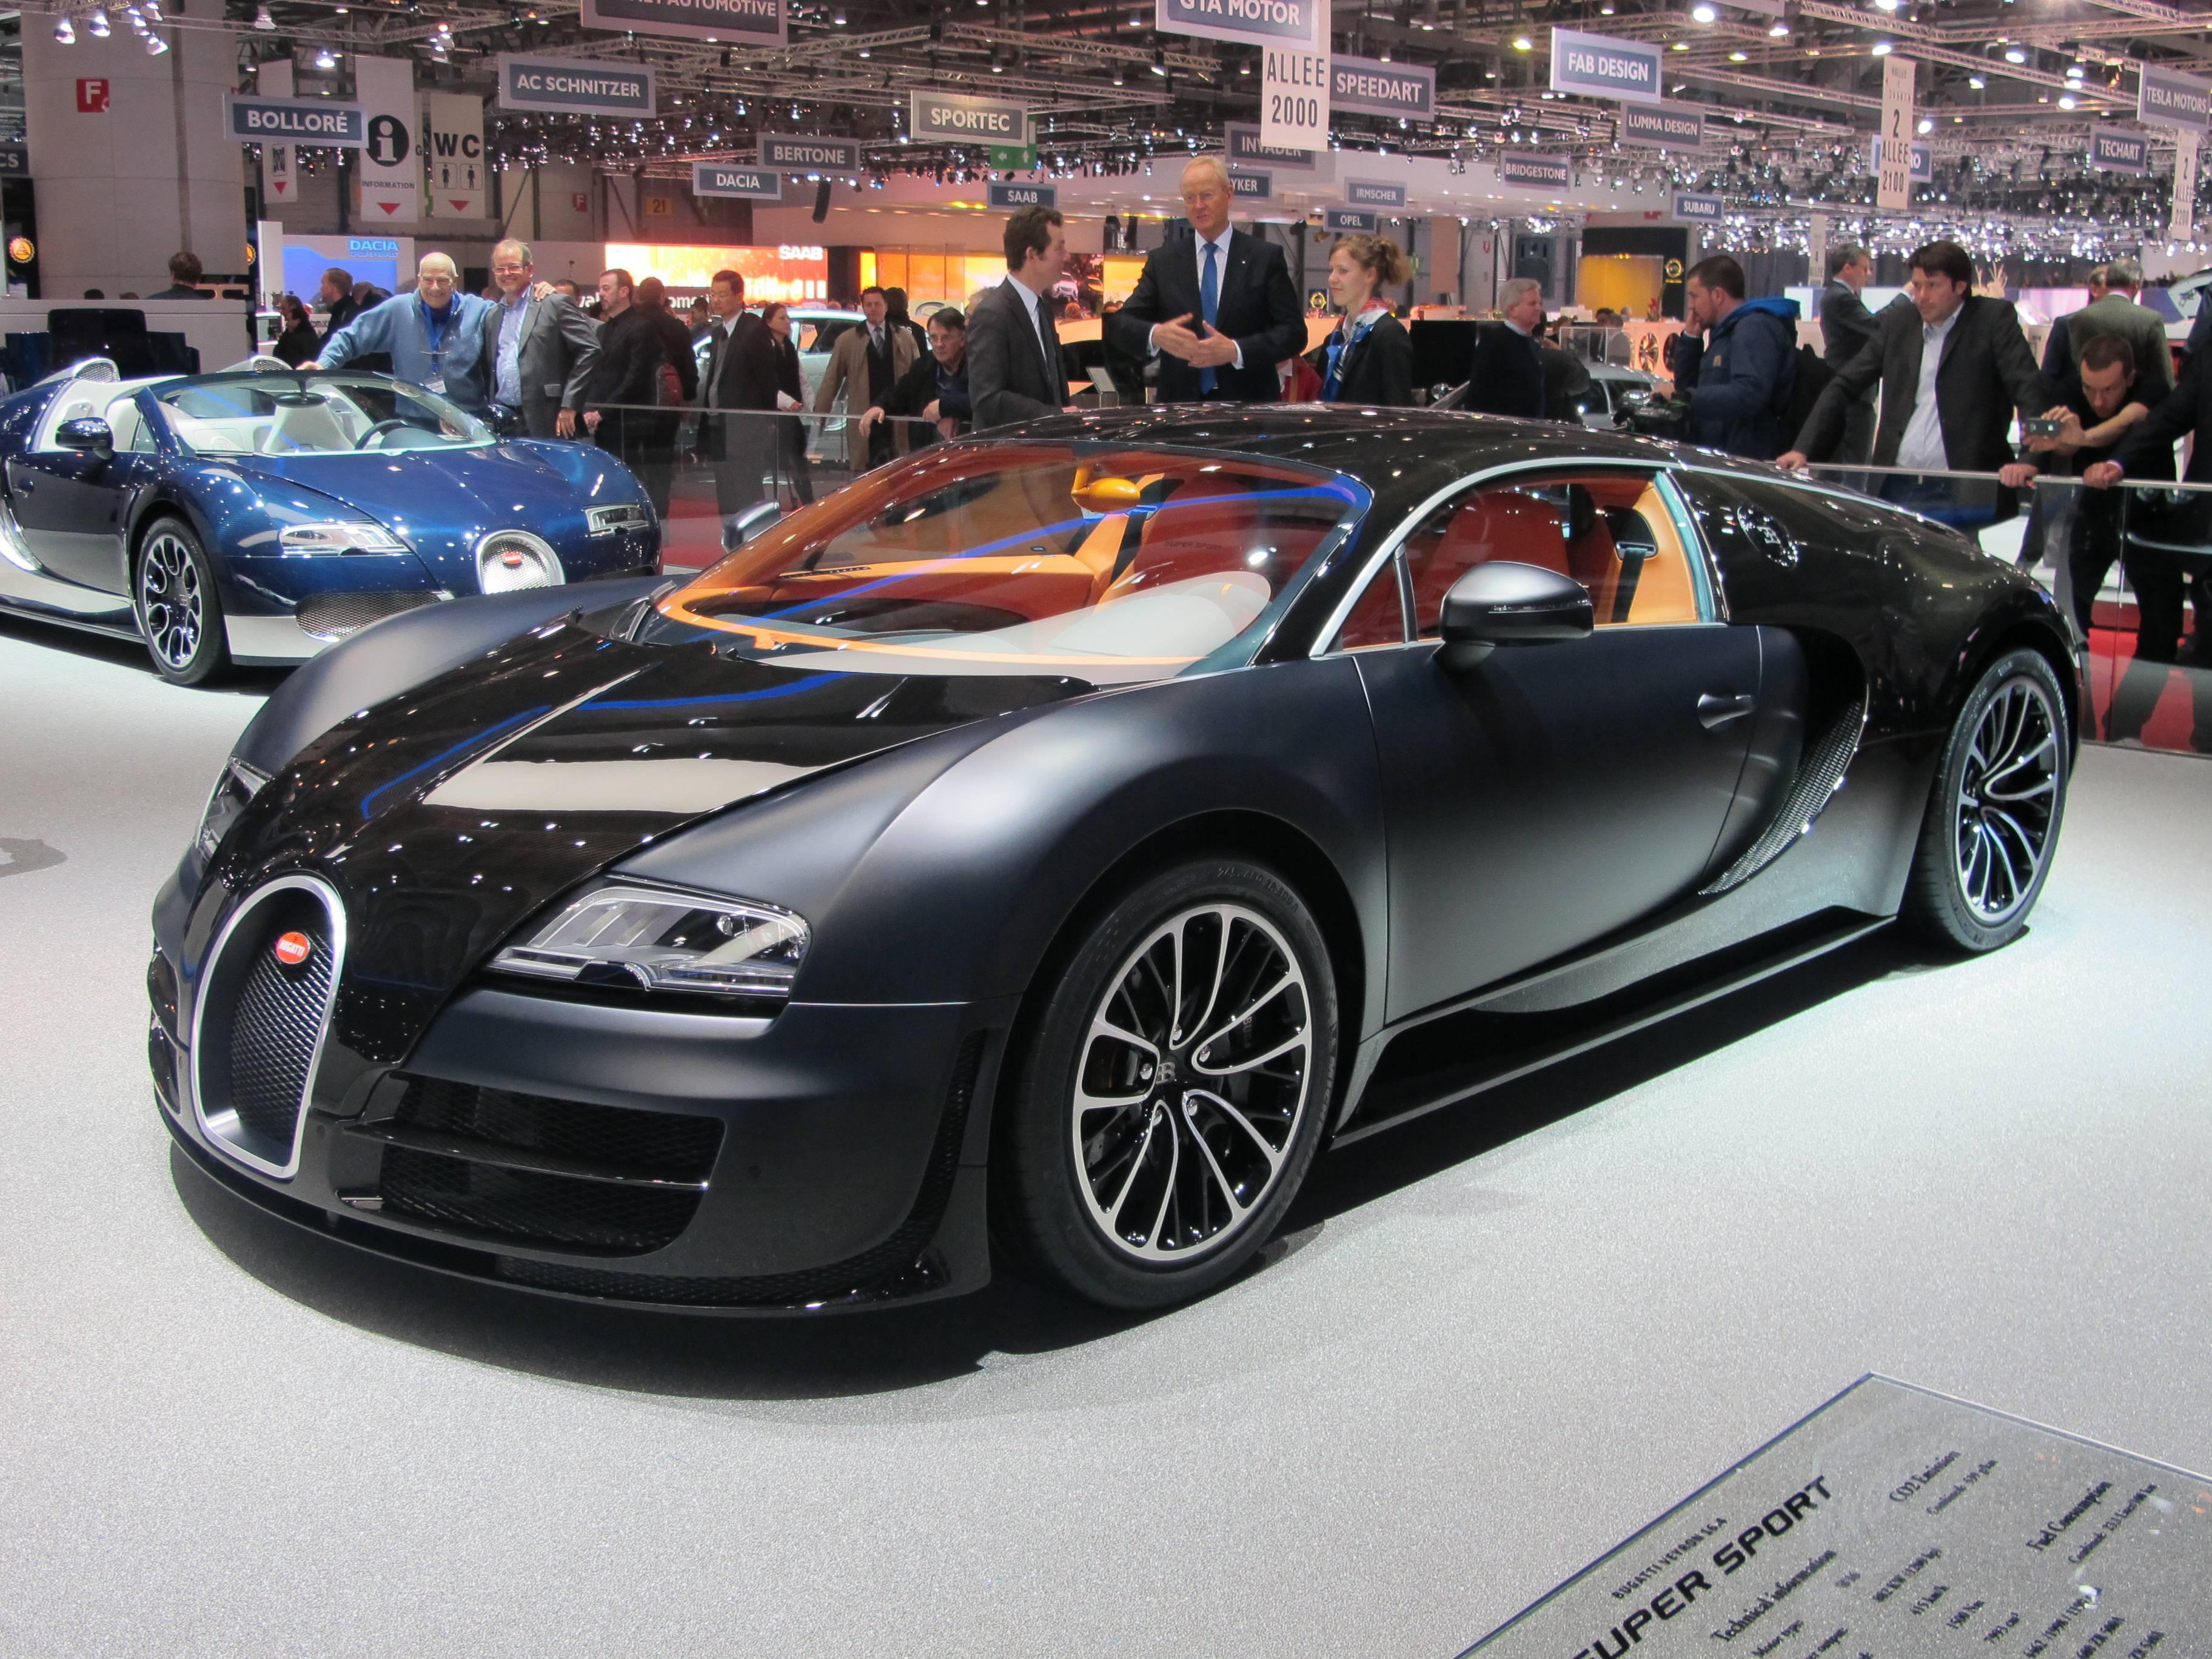 Geneva Motor Show - Bugatti's Speed Breaking Super Sport